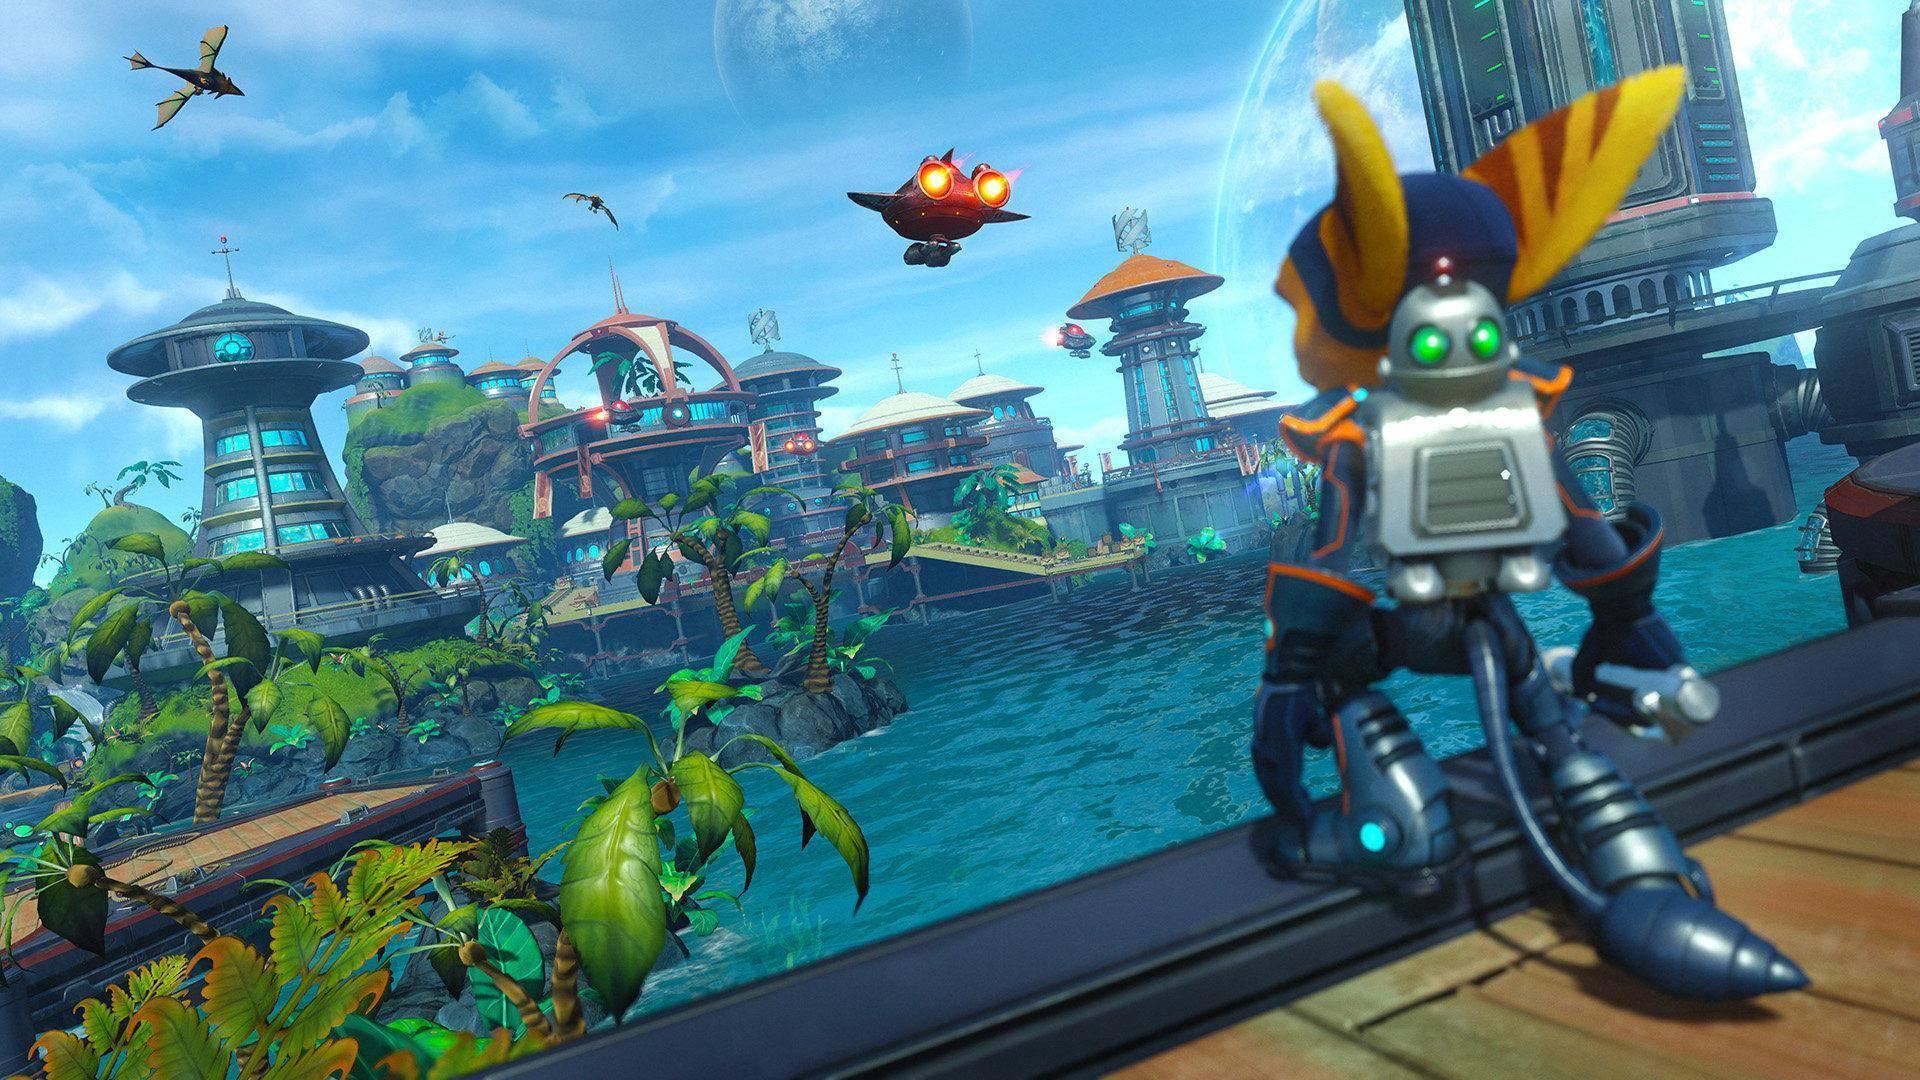 Ratchet & Clank op de PlayStation 5